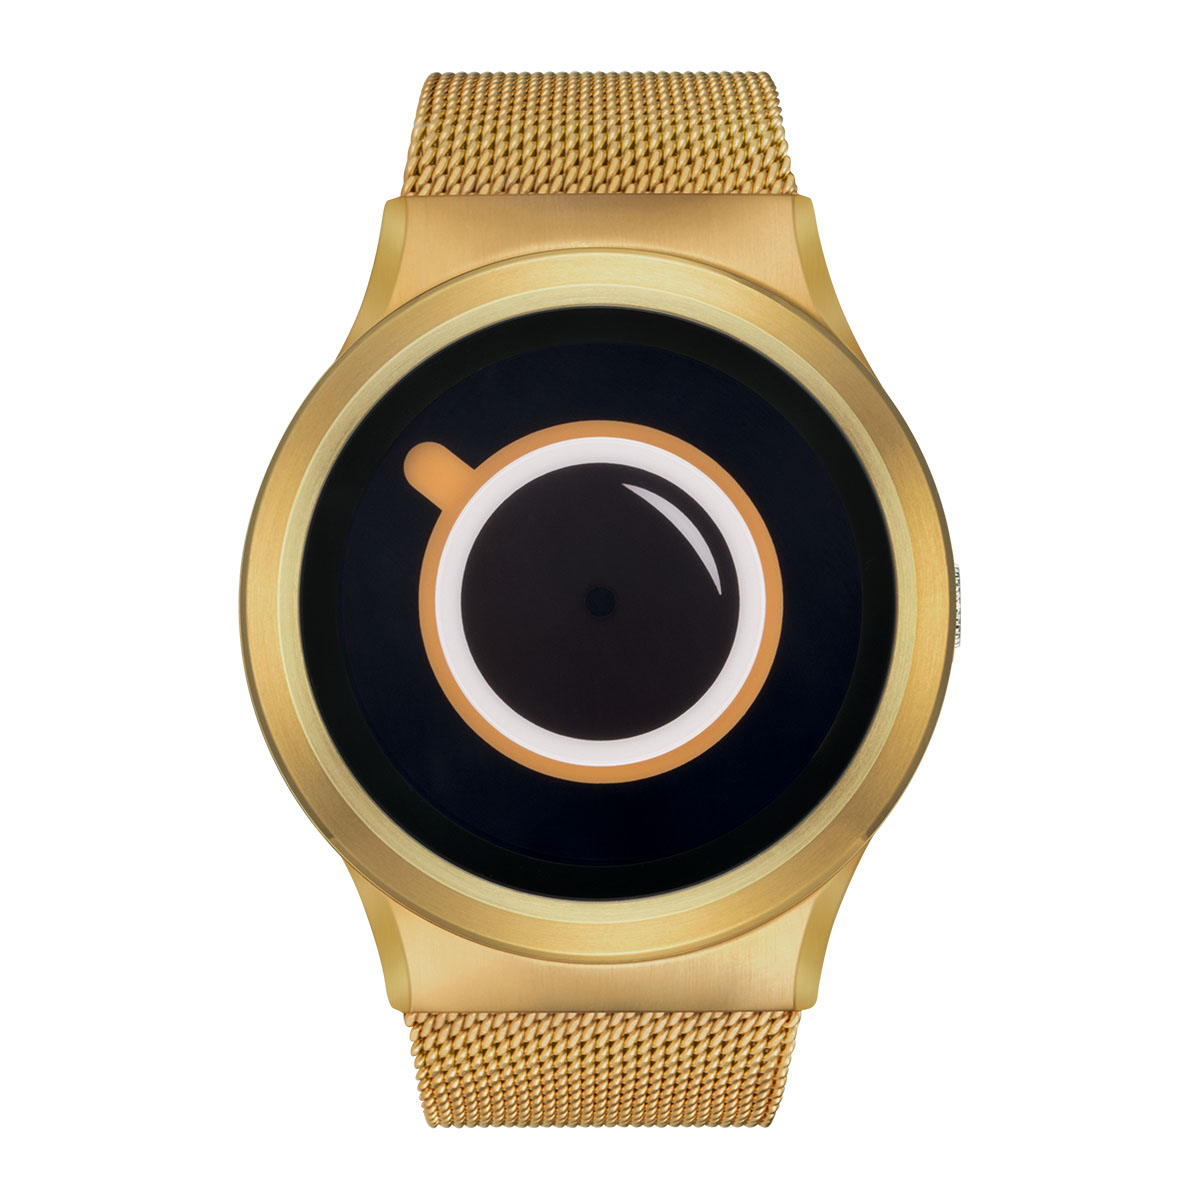 ZEROO COFFEE TIME ゼロ 電池式クォーツ 腕時計 [W03009B04SM04] ベージュ デザインウォッチ ペア用 メンズ レディース ユニセックス おしゃれ時計 デザイナーズ